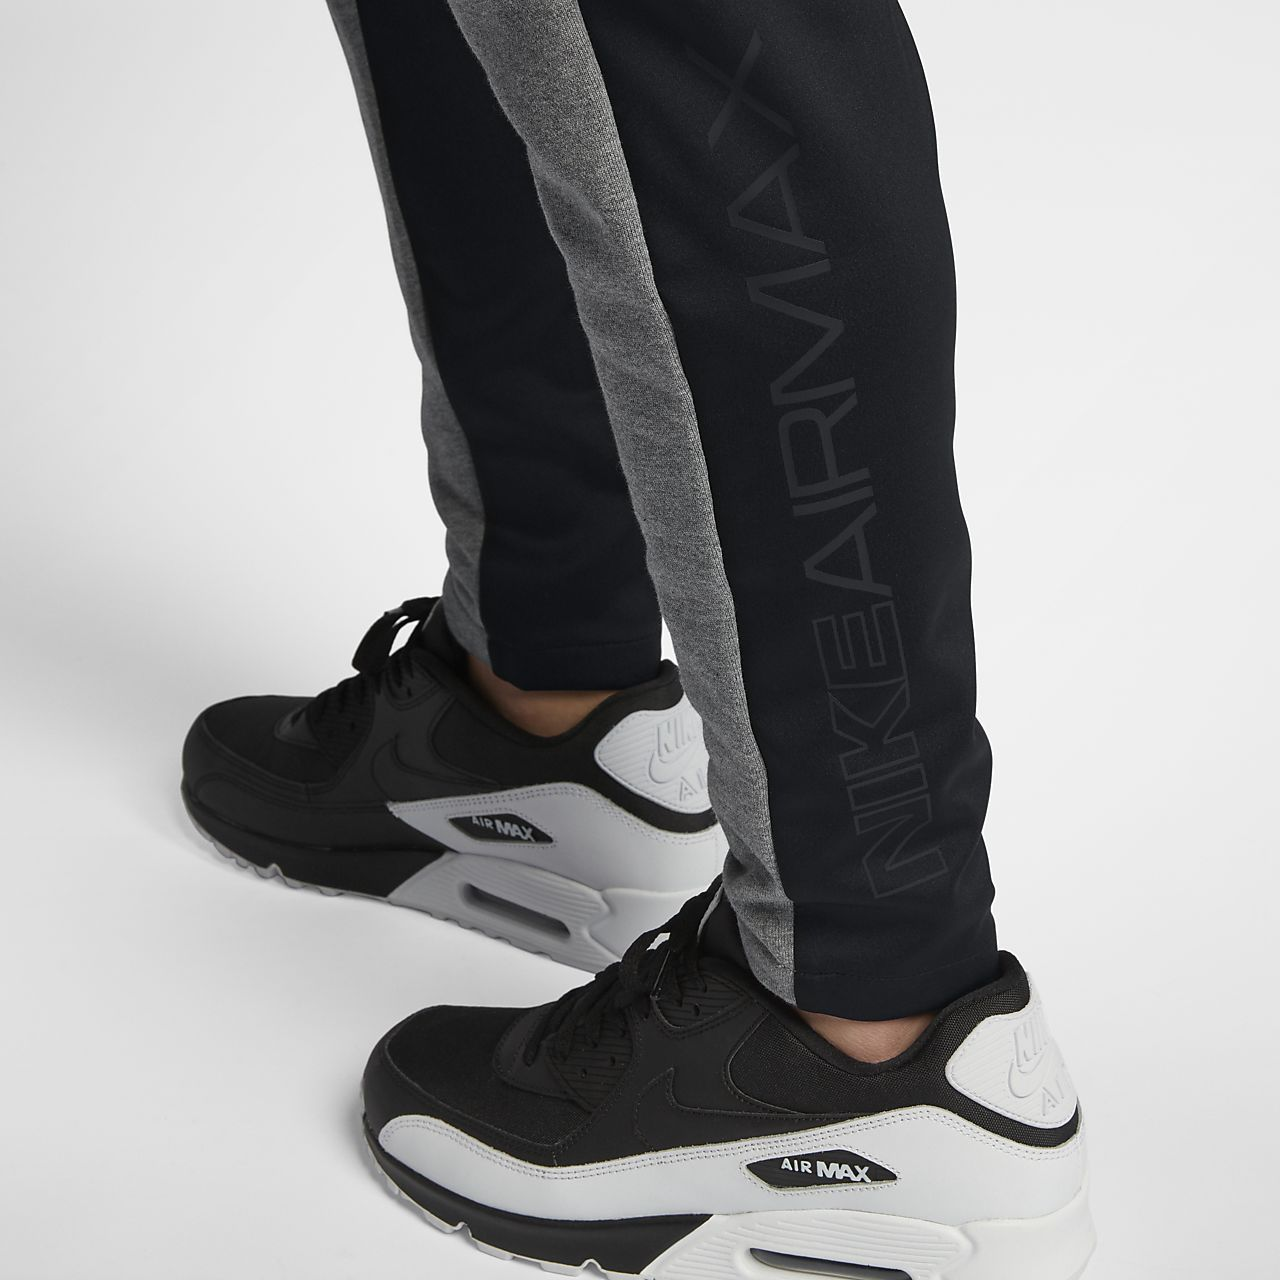 3c1b54a2fc Nike Sportswear Air Max Men's Joggers | pants in 2019 | Nike air max ...